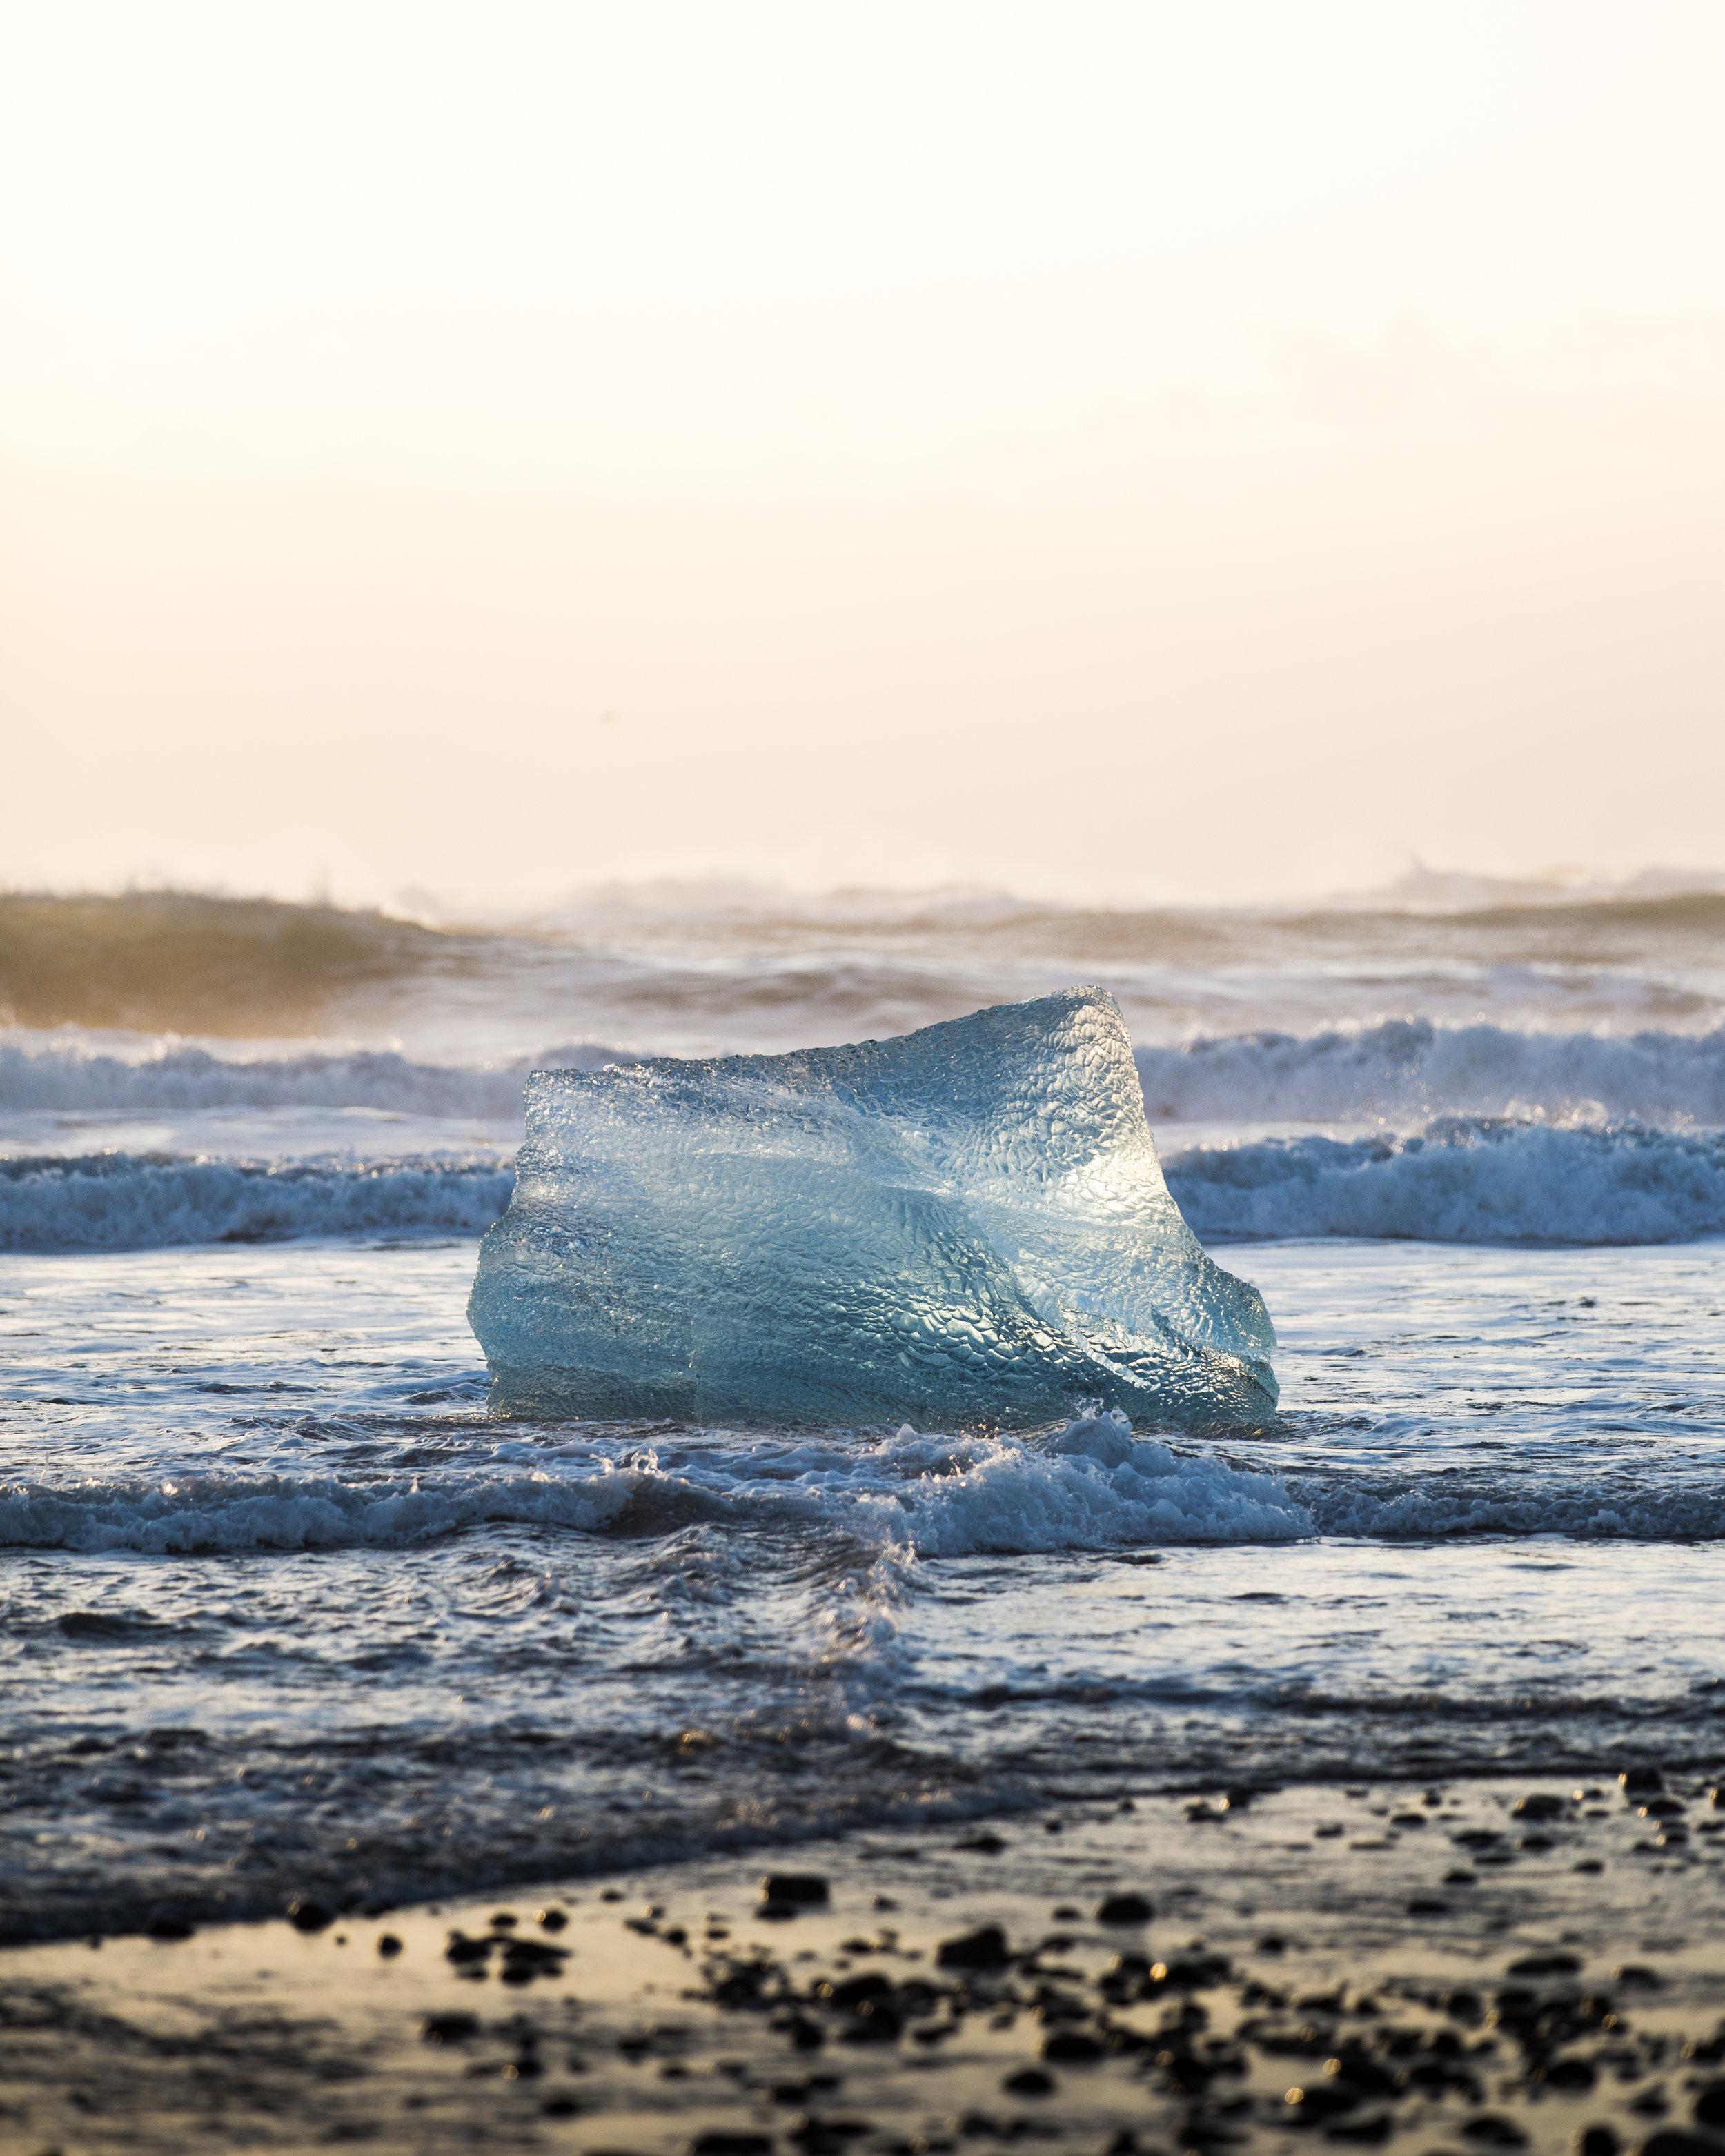 jermiah-schuster-iceland-407.jpg